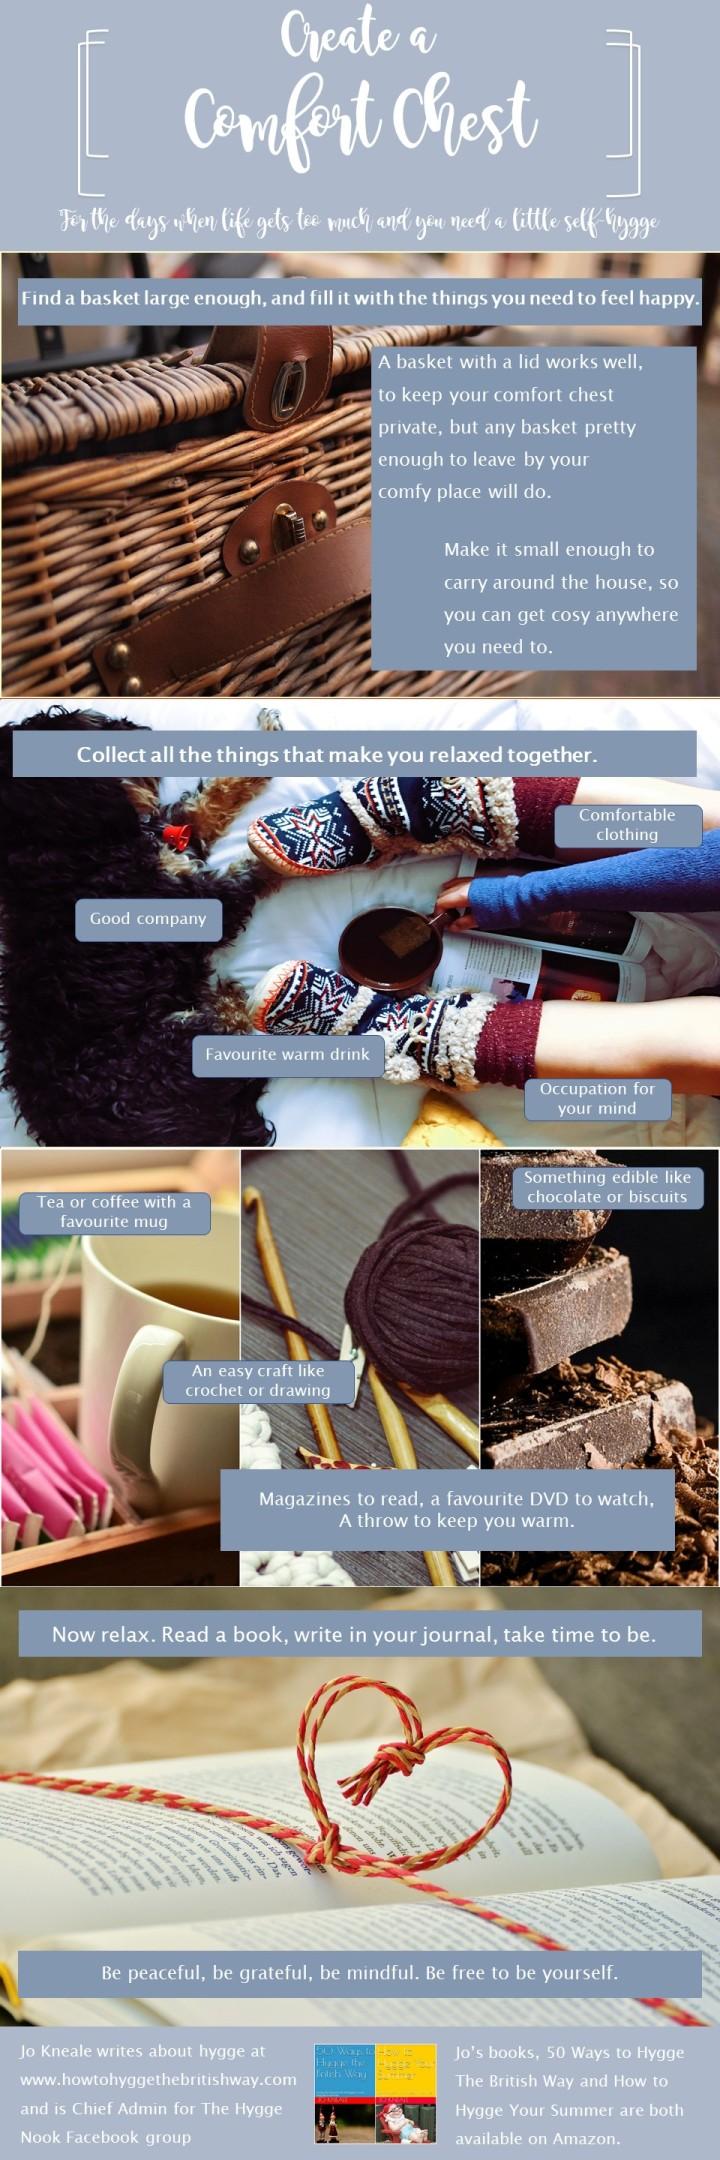 Create a Comfort Basket Infographic.jpg